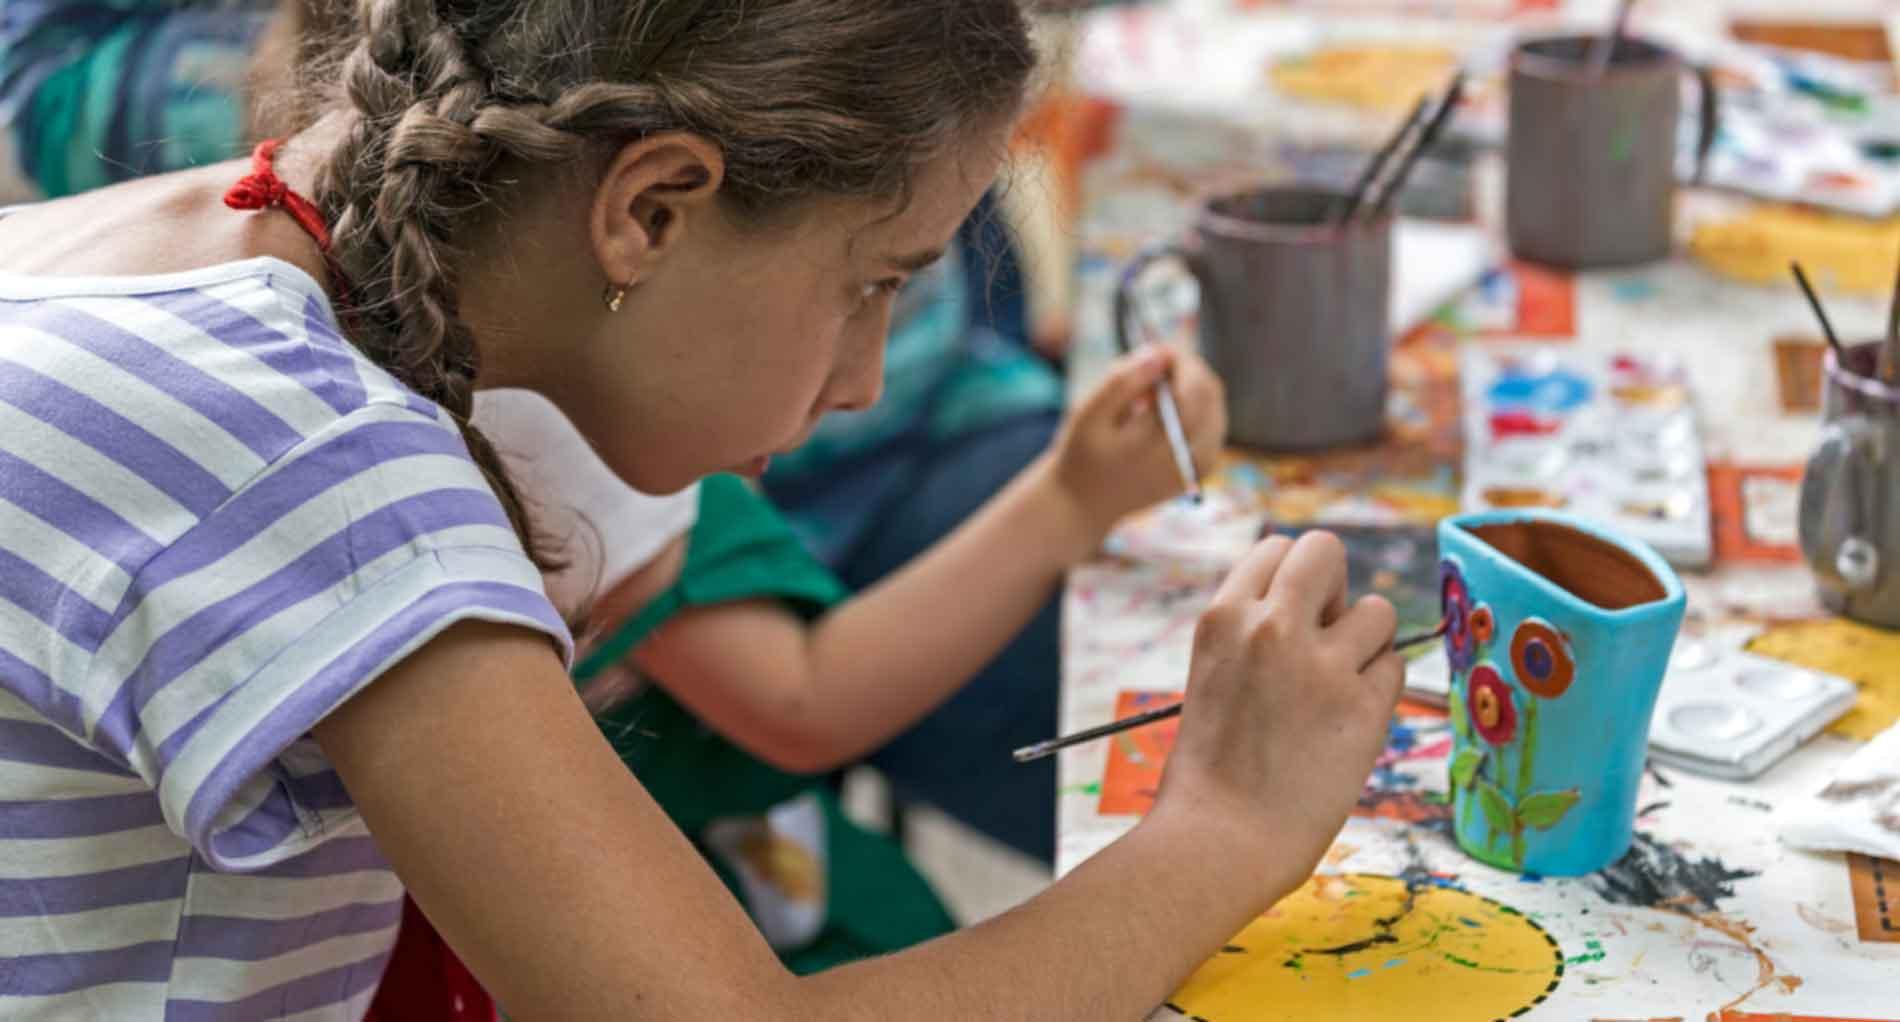 Uncorked Binghamton Kids Ceramics Studio